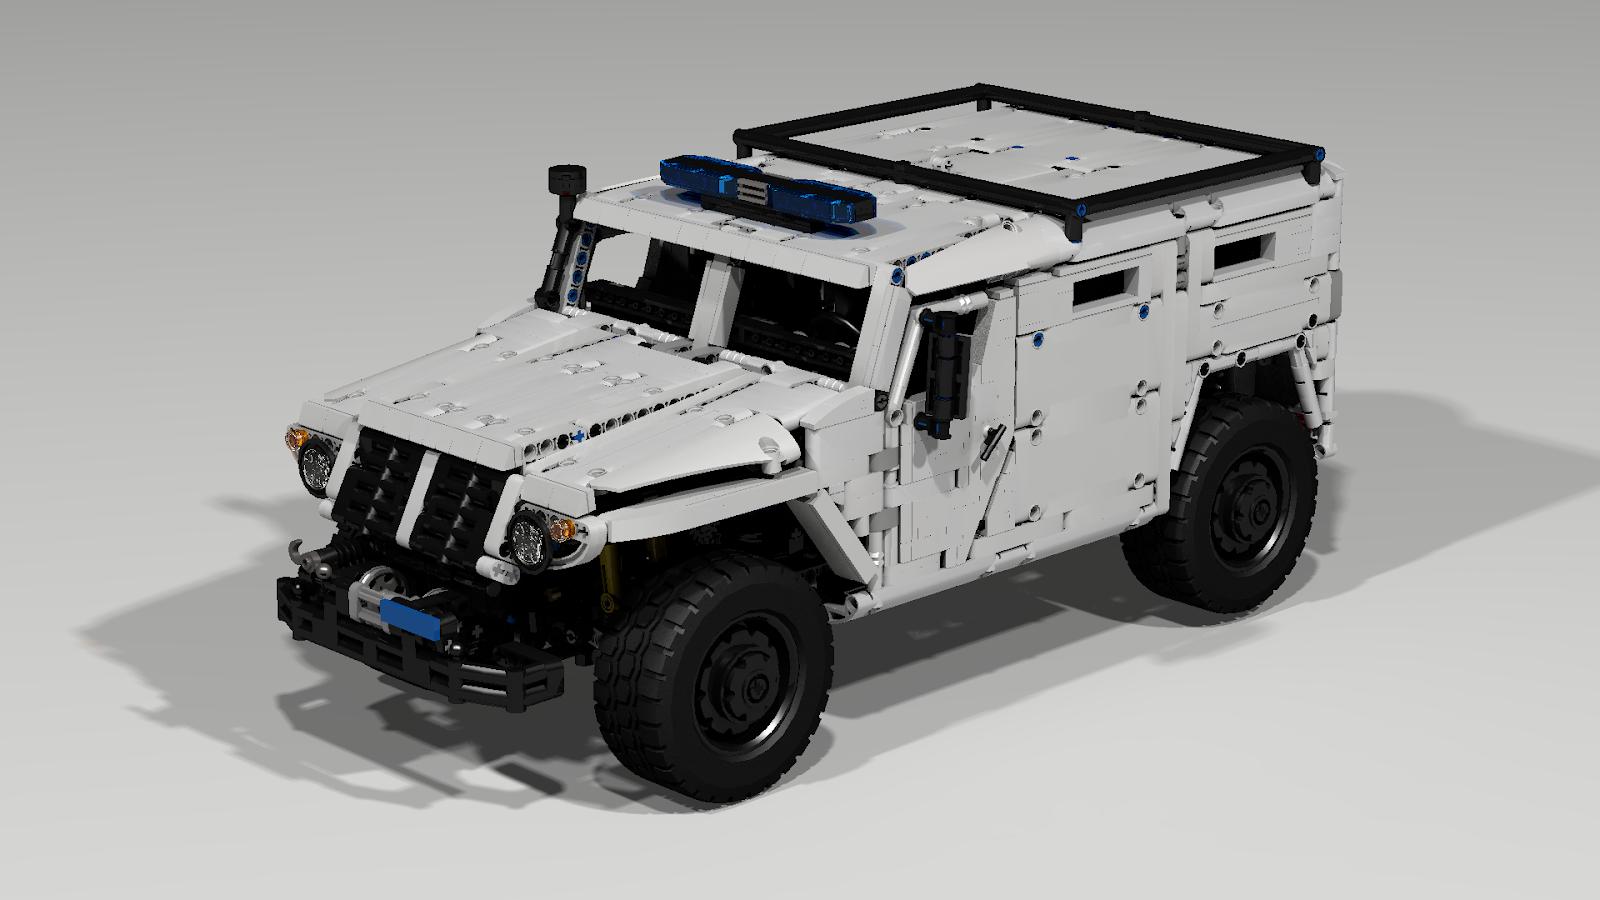 Filsawgood Lego Technic Creations Gaz Tiger Spm 2 Building